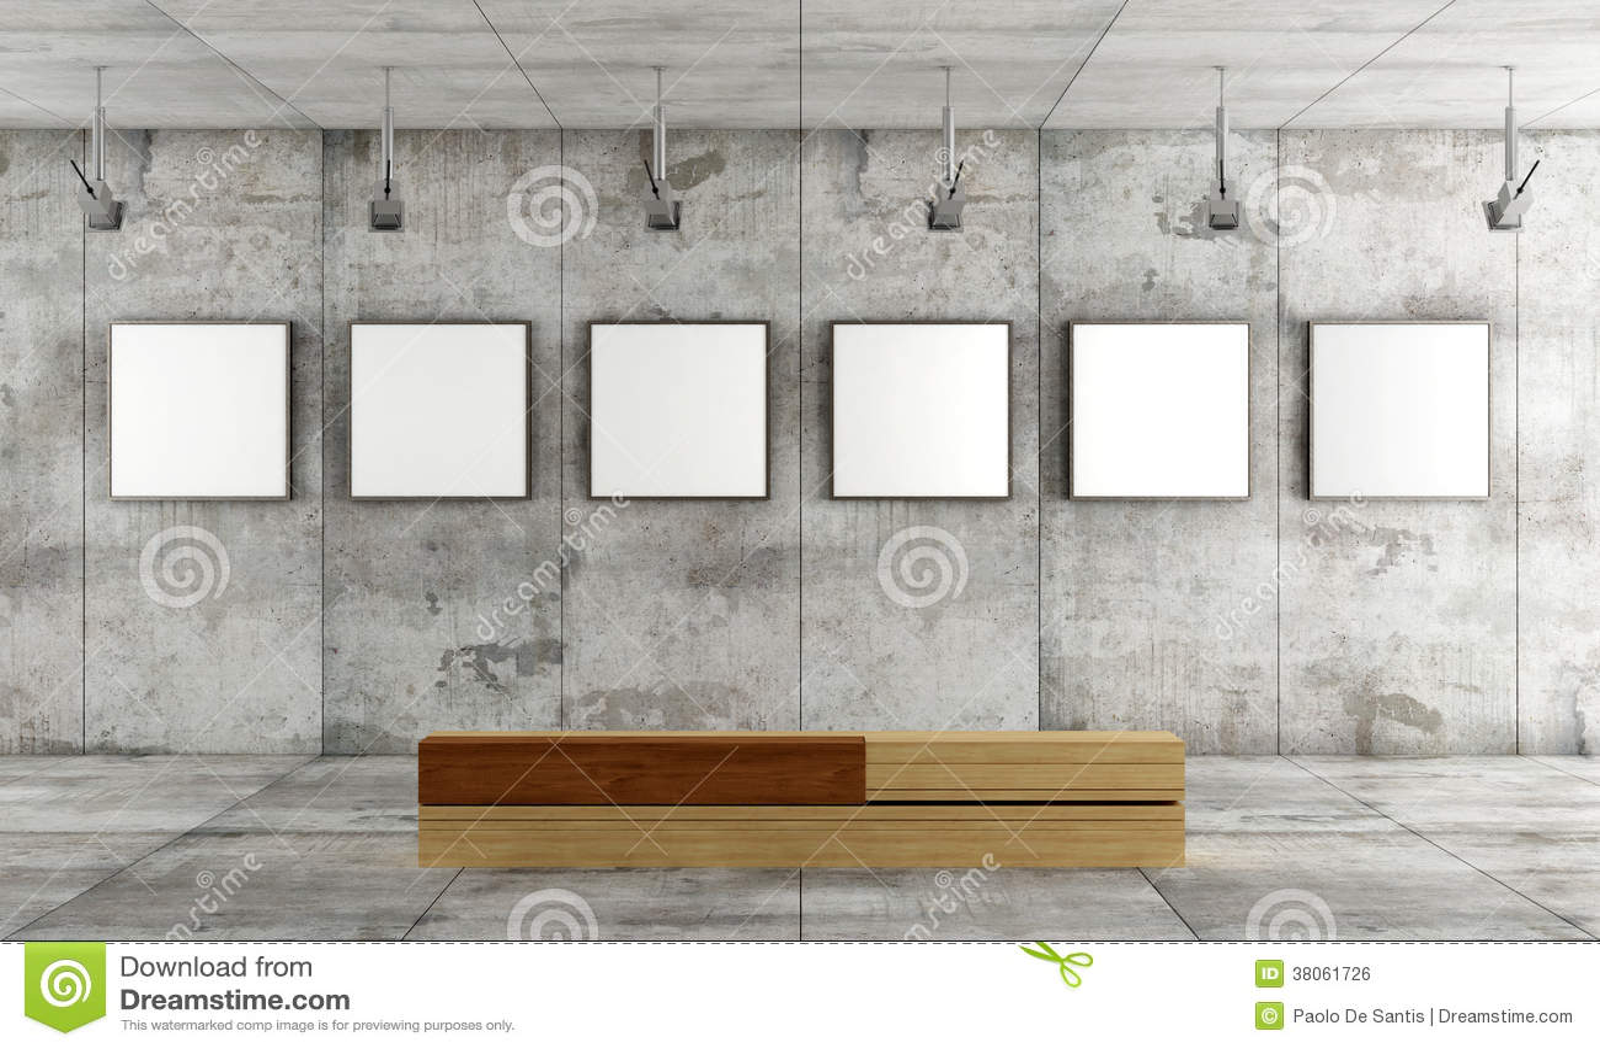 galerie d 39 art contemporain illustration stock illustration du blanc 38061726. Black Bedroom Furniture Sets. Home Design Ideas